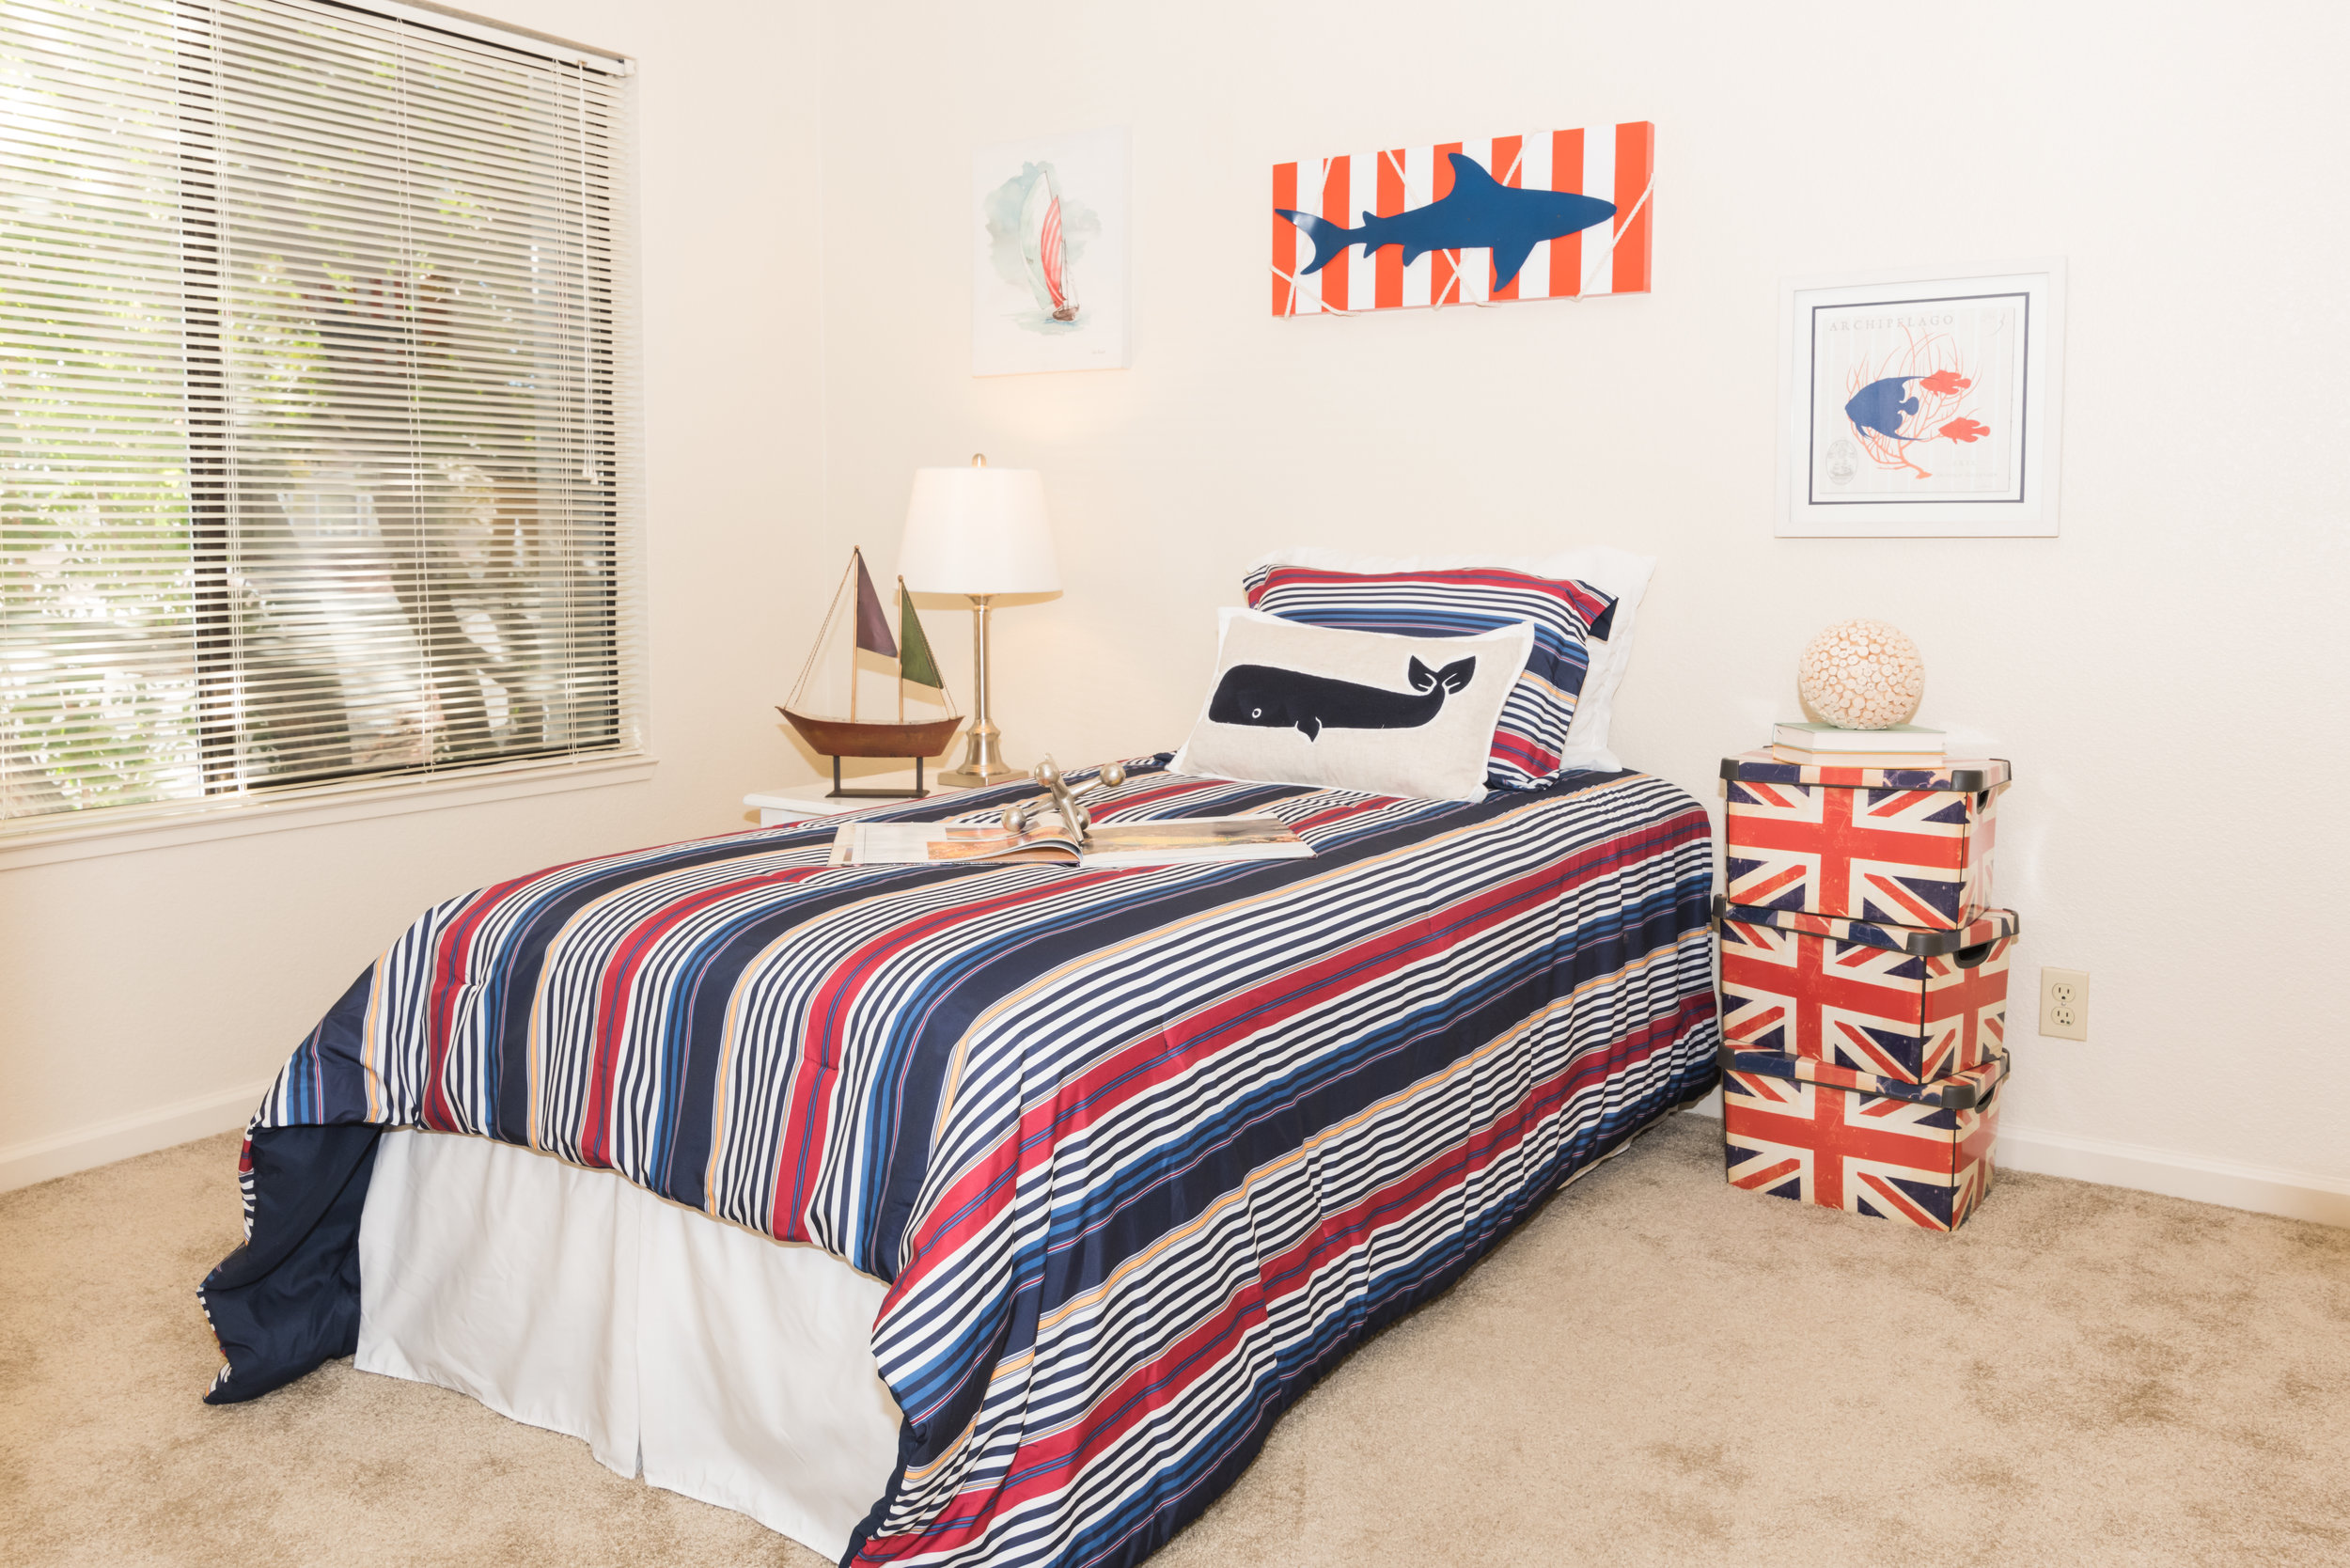 Second Bedroom in Rental Townhome